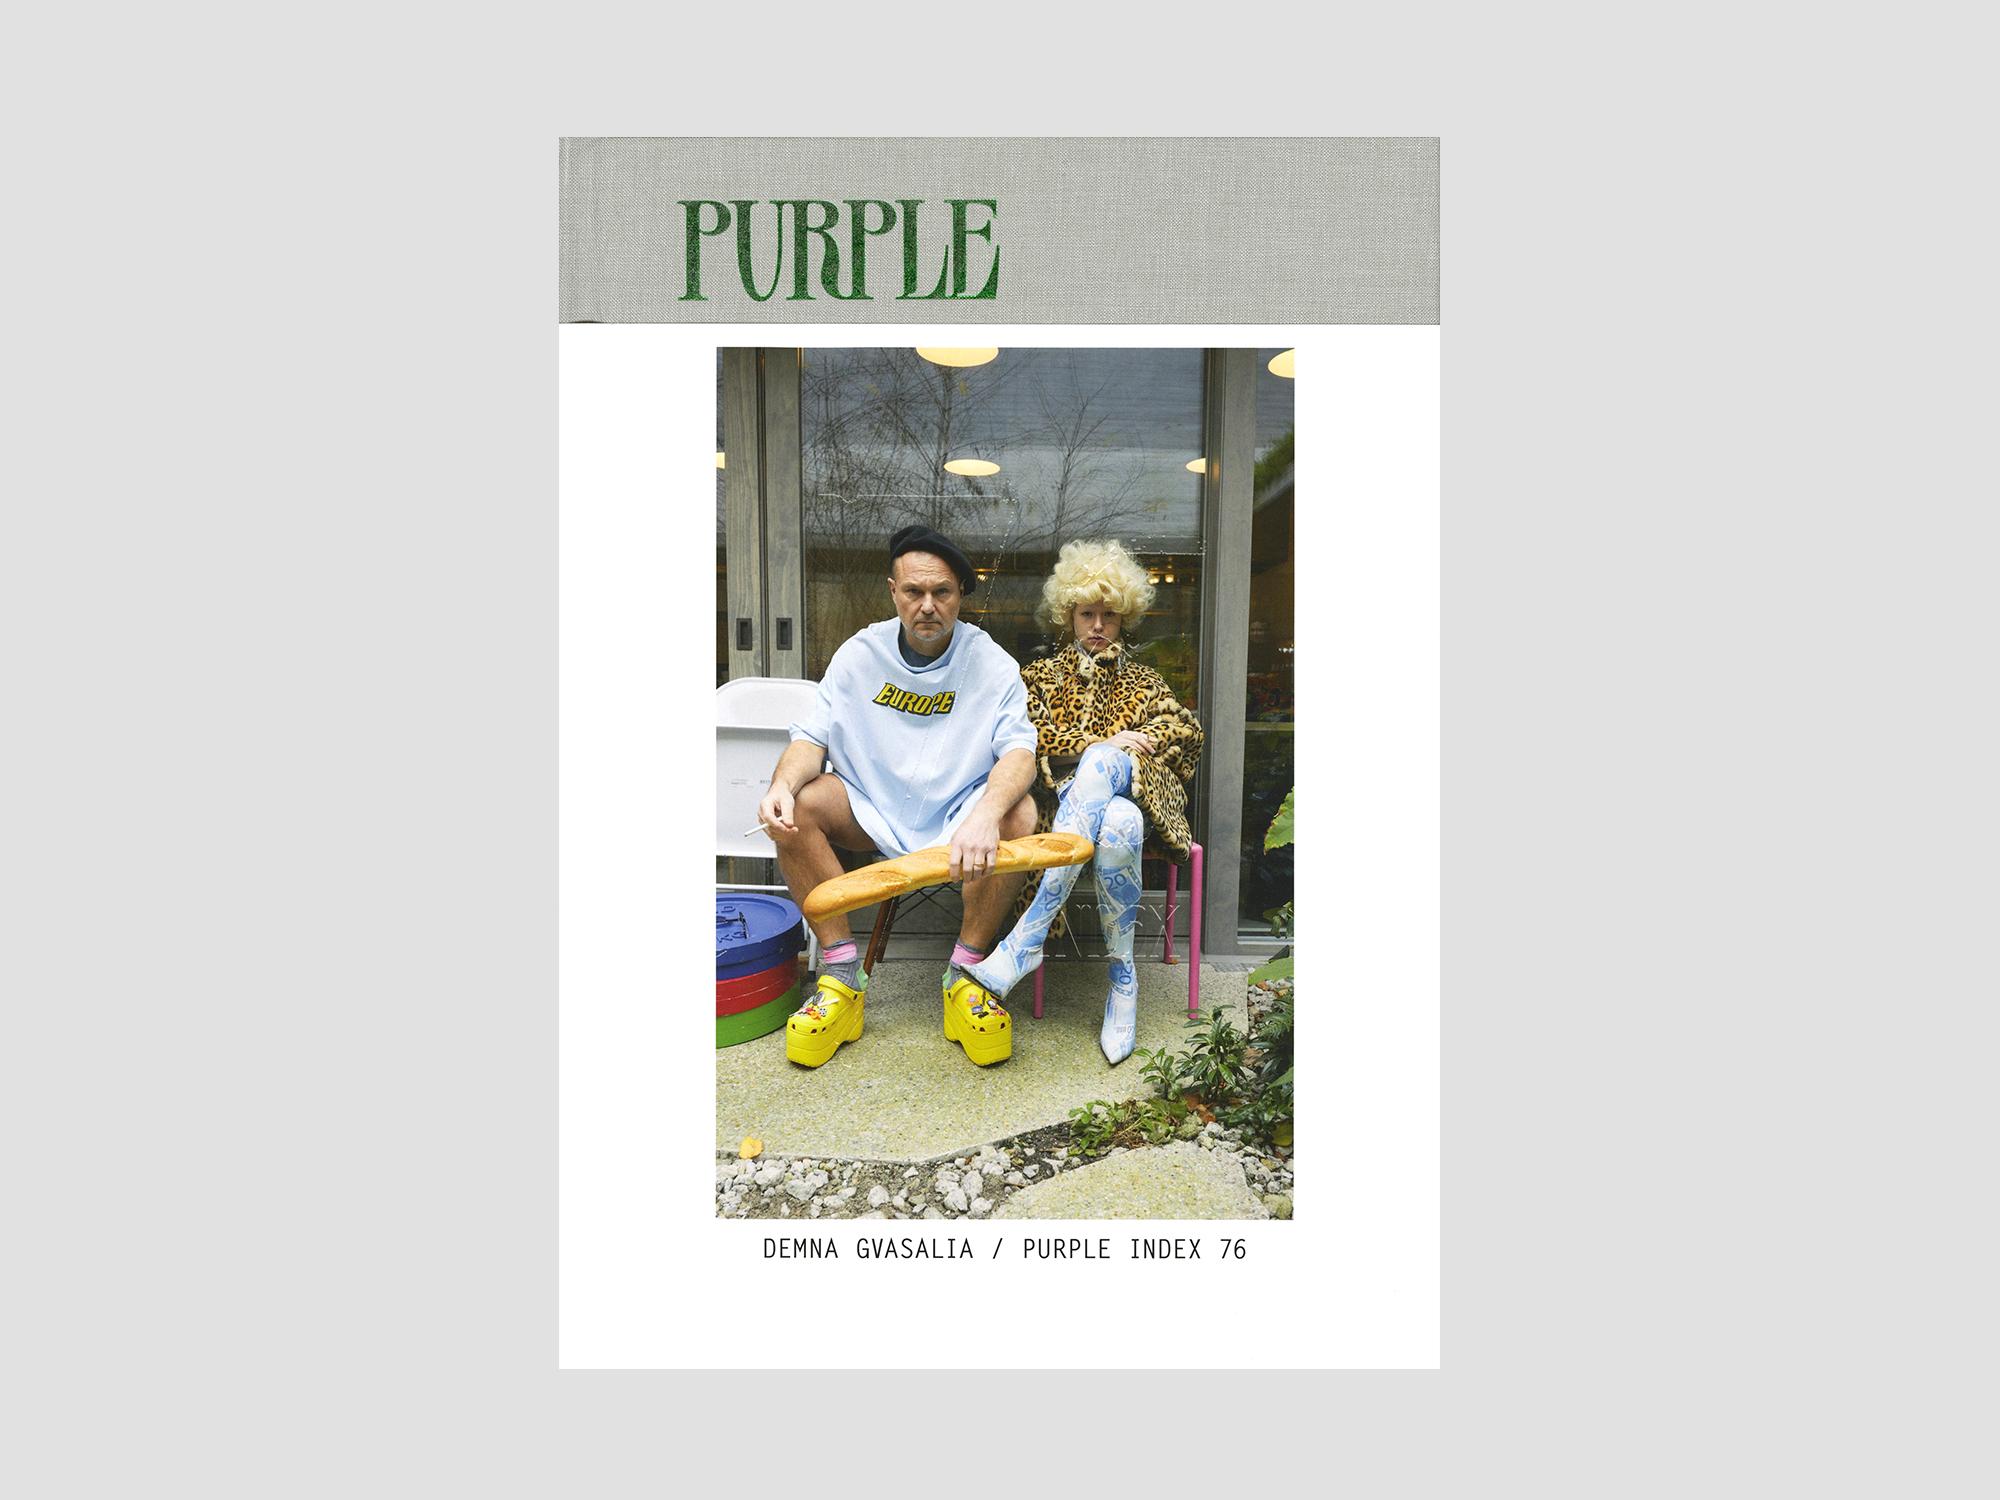 Purple 76 Index issue 29 S/S 2018